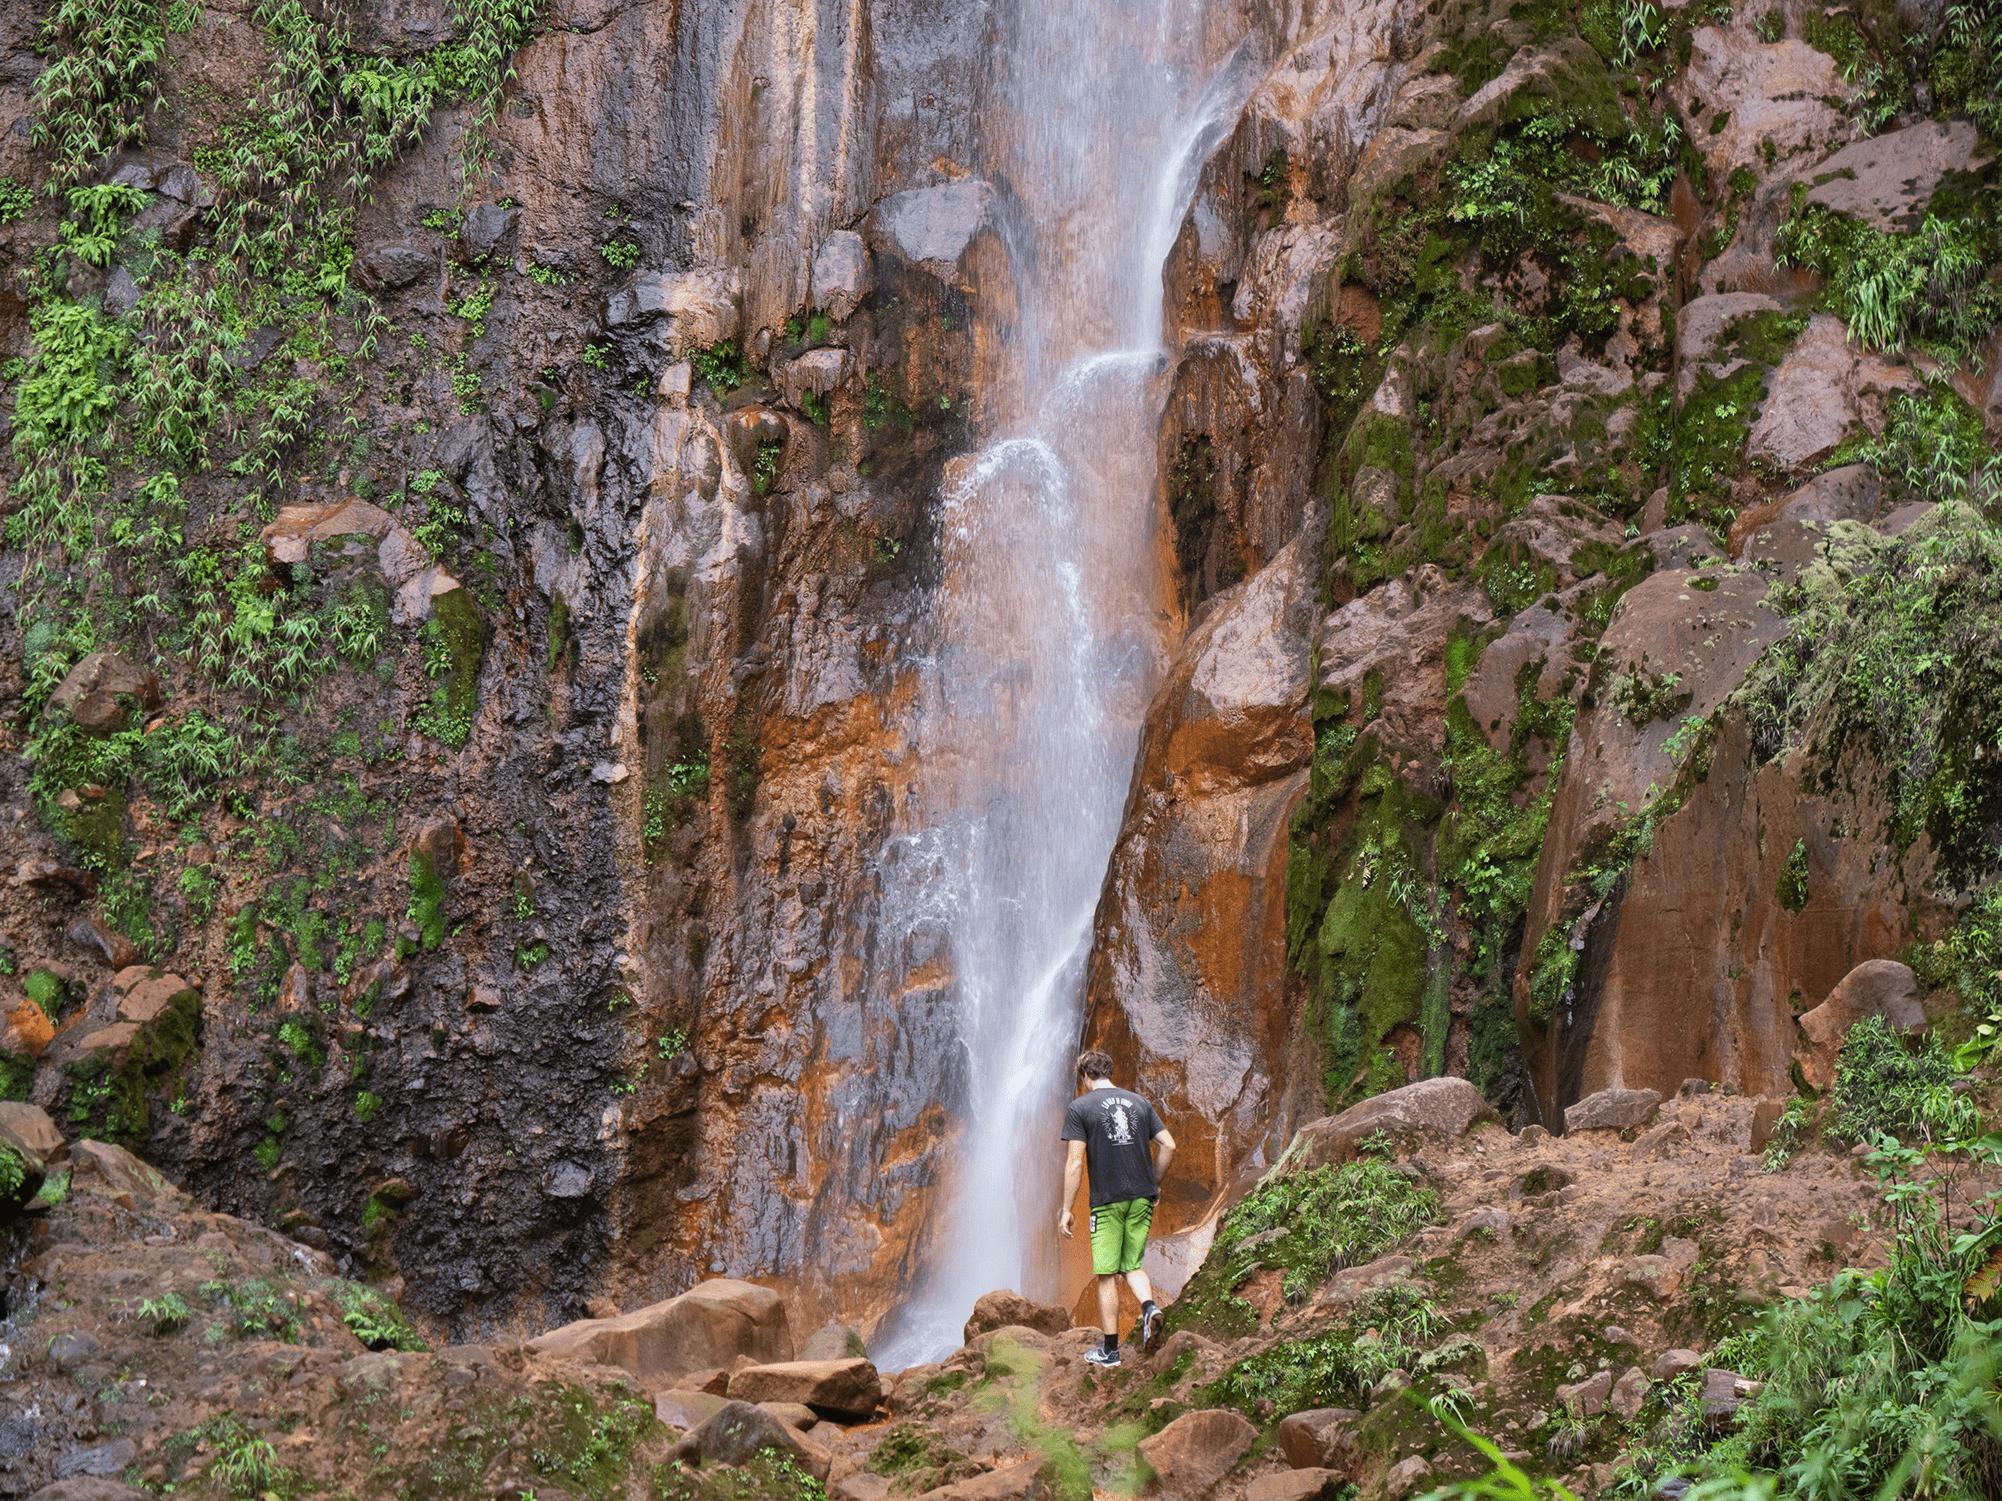 cascade-chute-du-carbet-basse-terre-guadeloupe